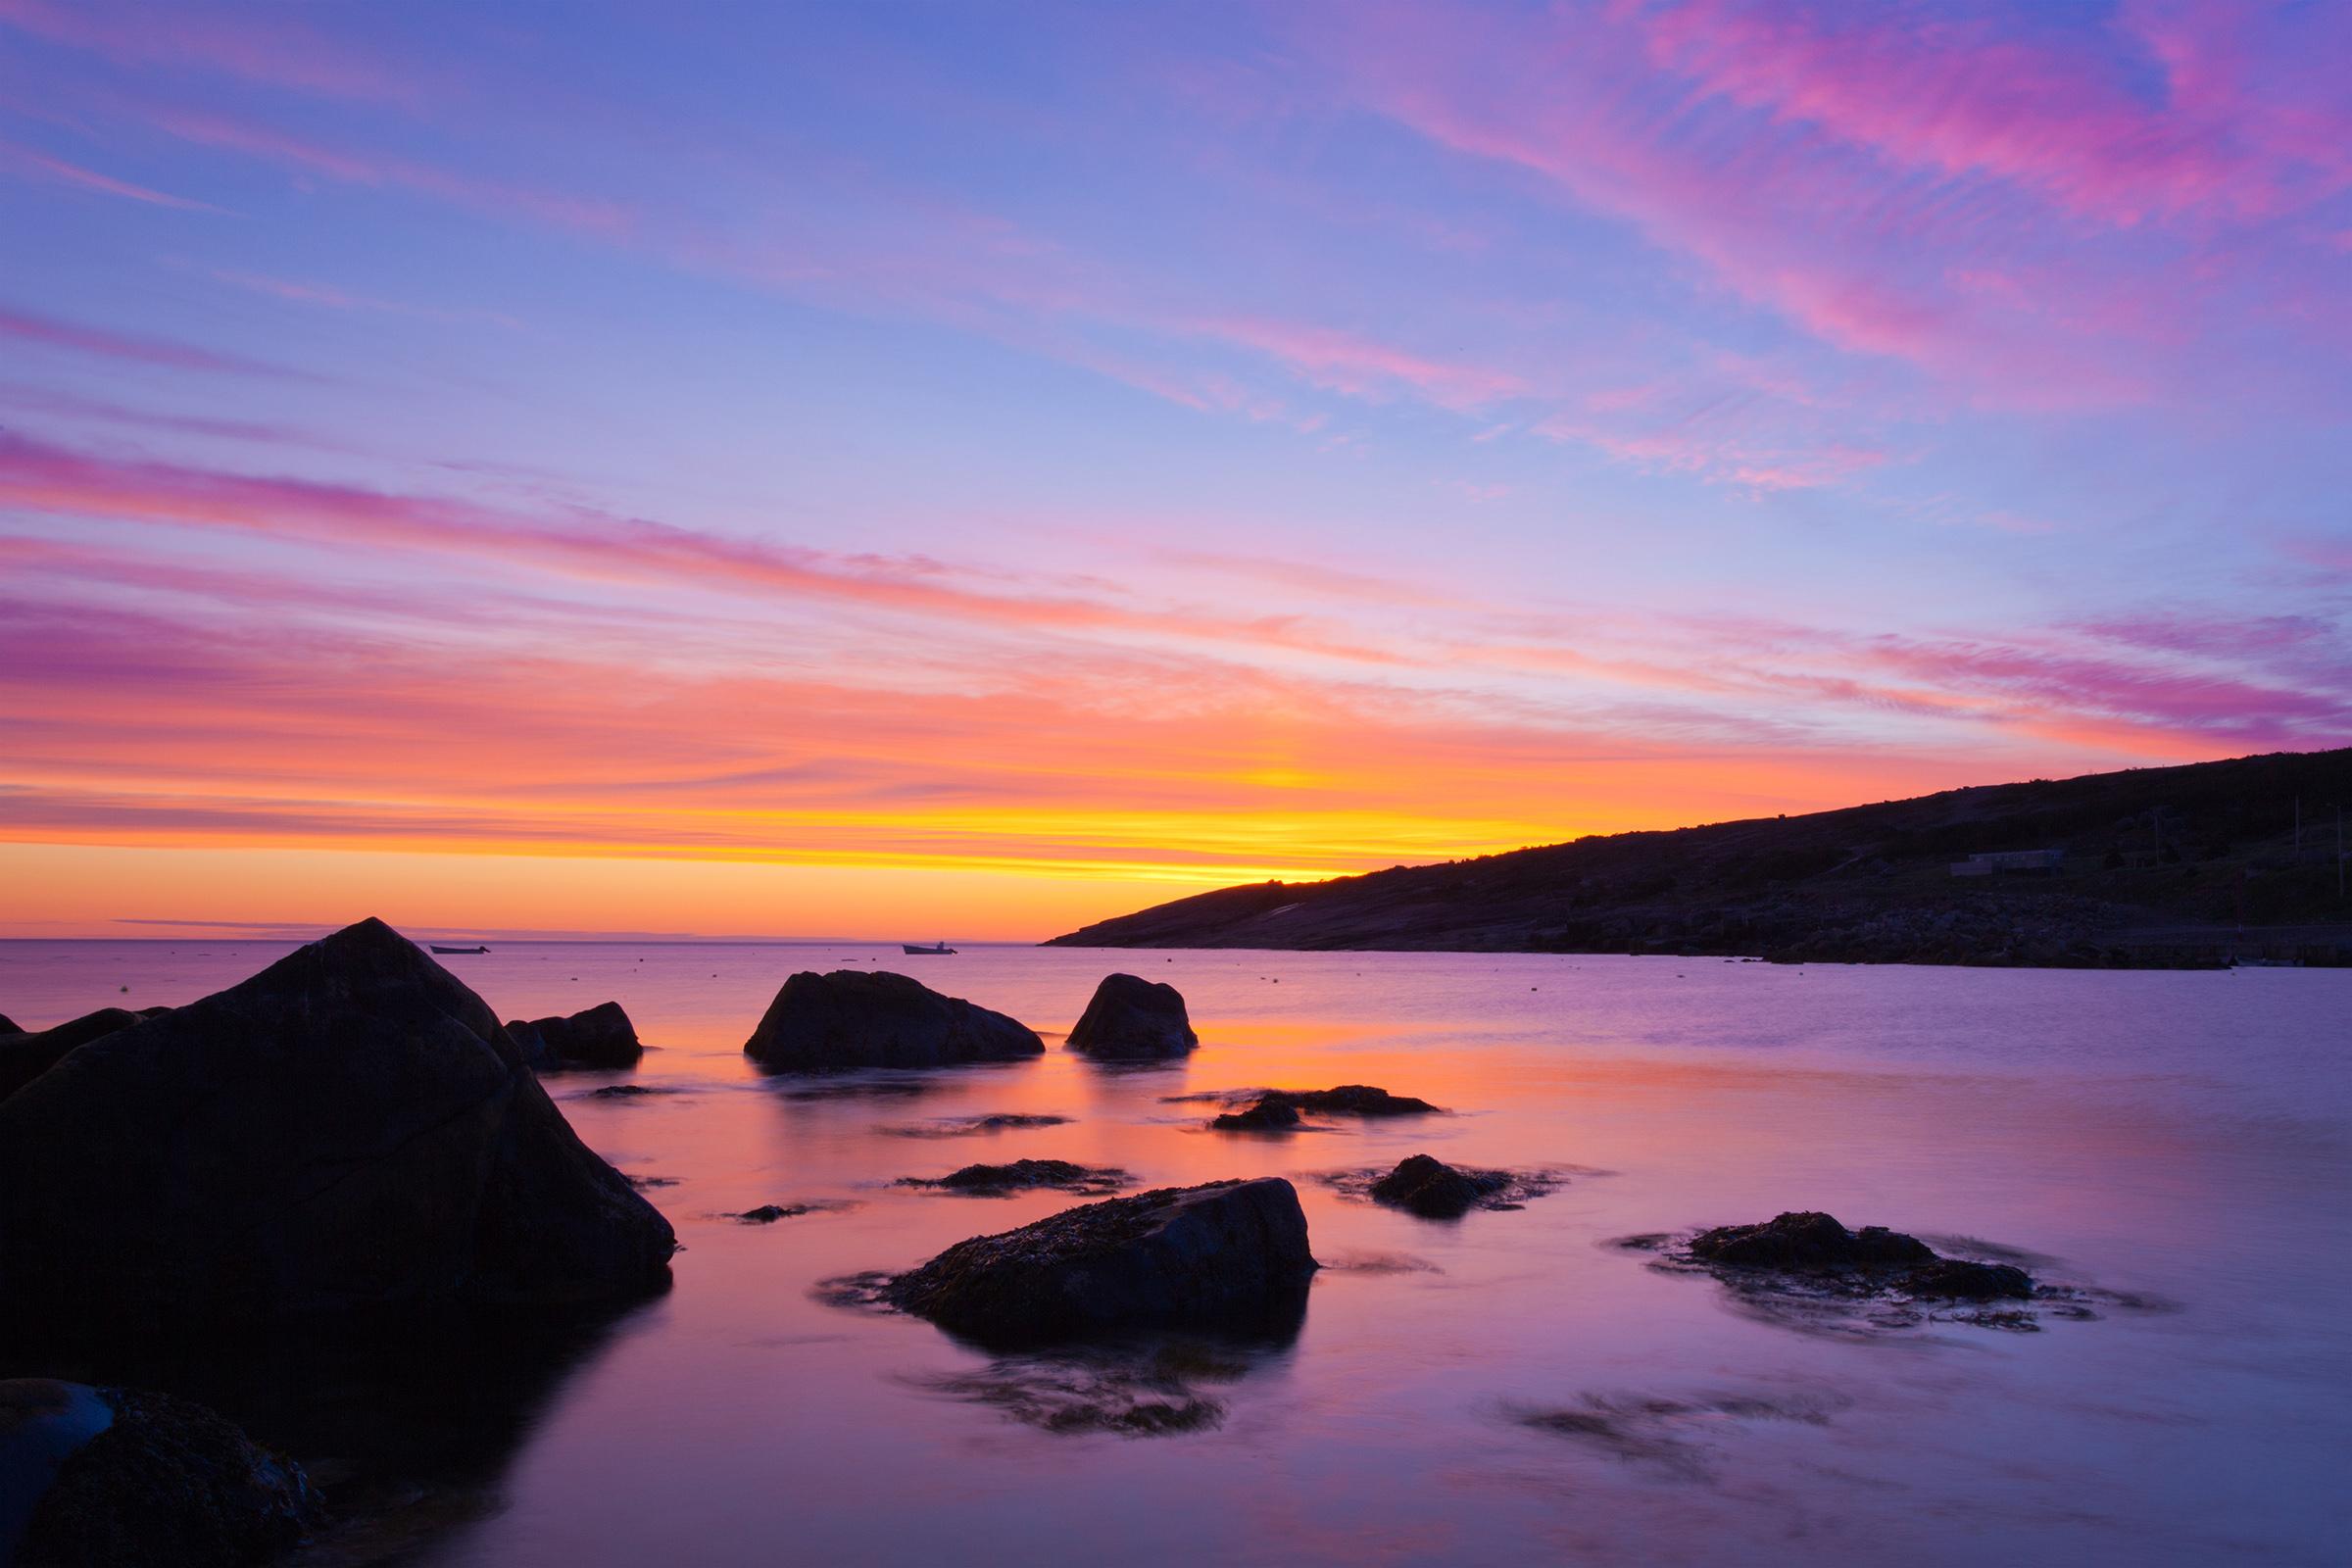 Ocean sunrise photo